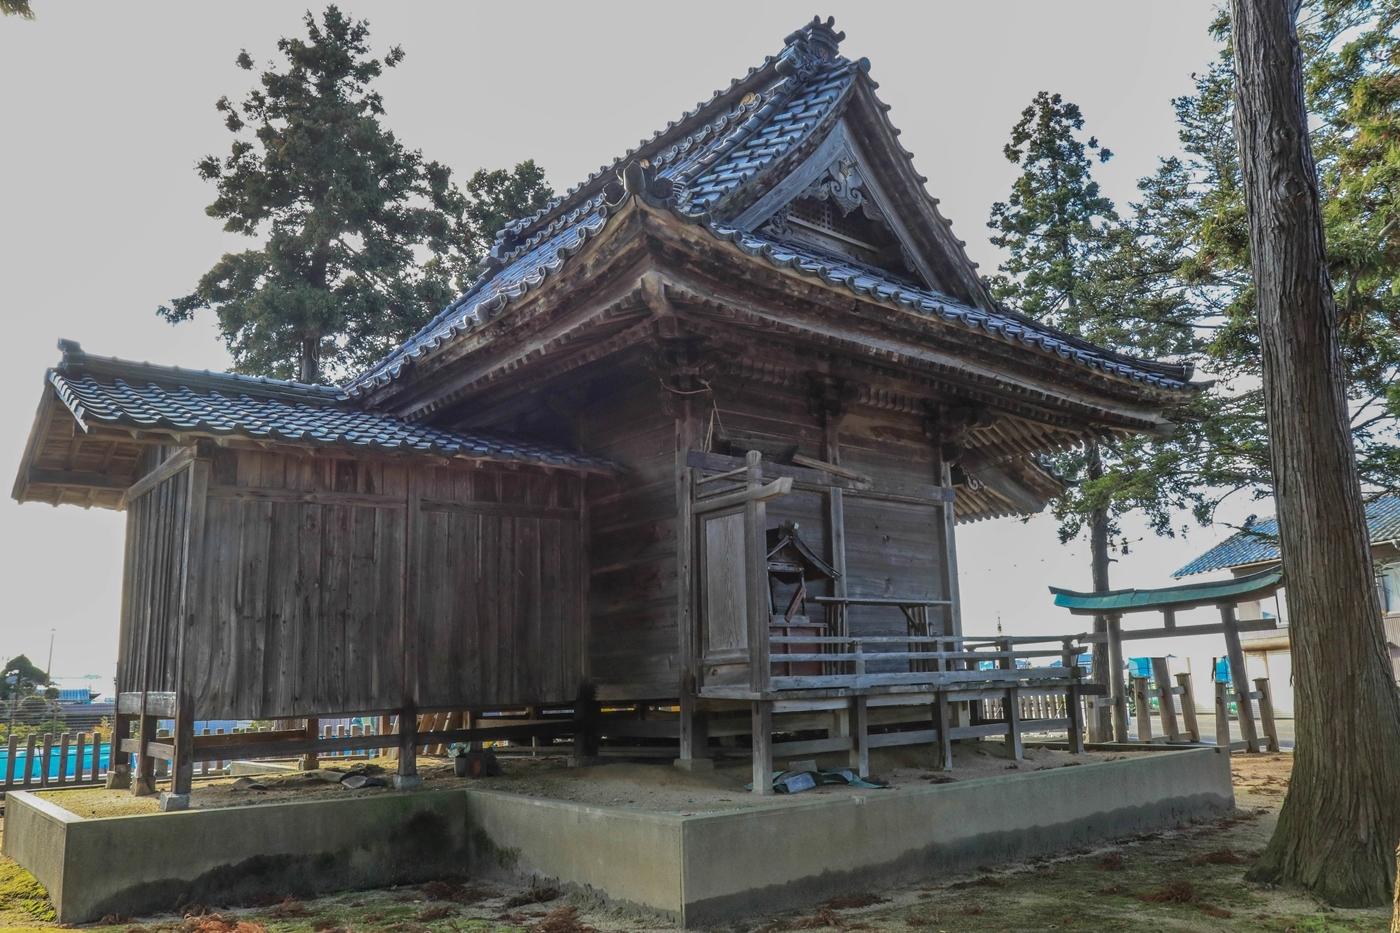 ●SLA2018・11・26阿賀野市前山諏訪神社_12 (1 - 1)